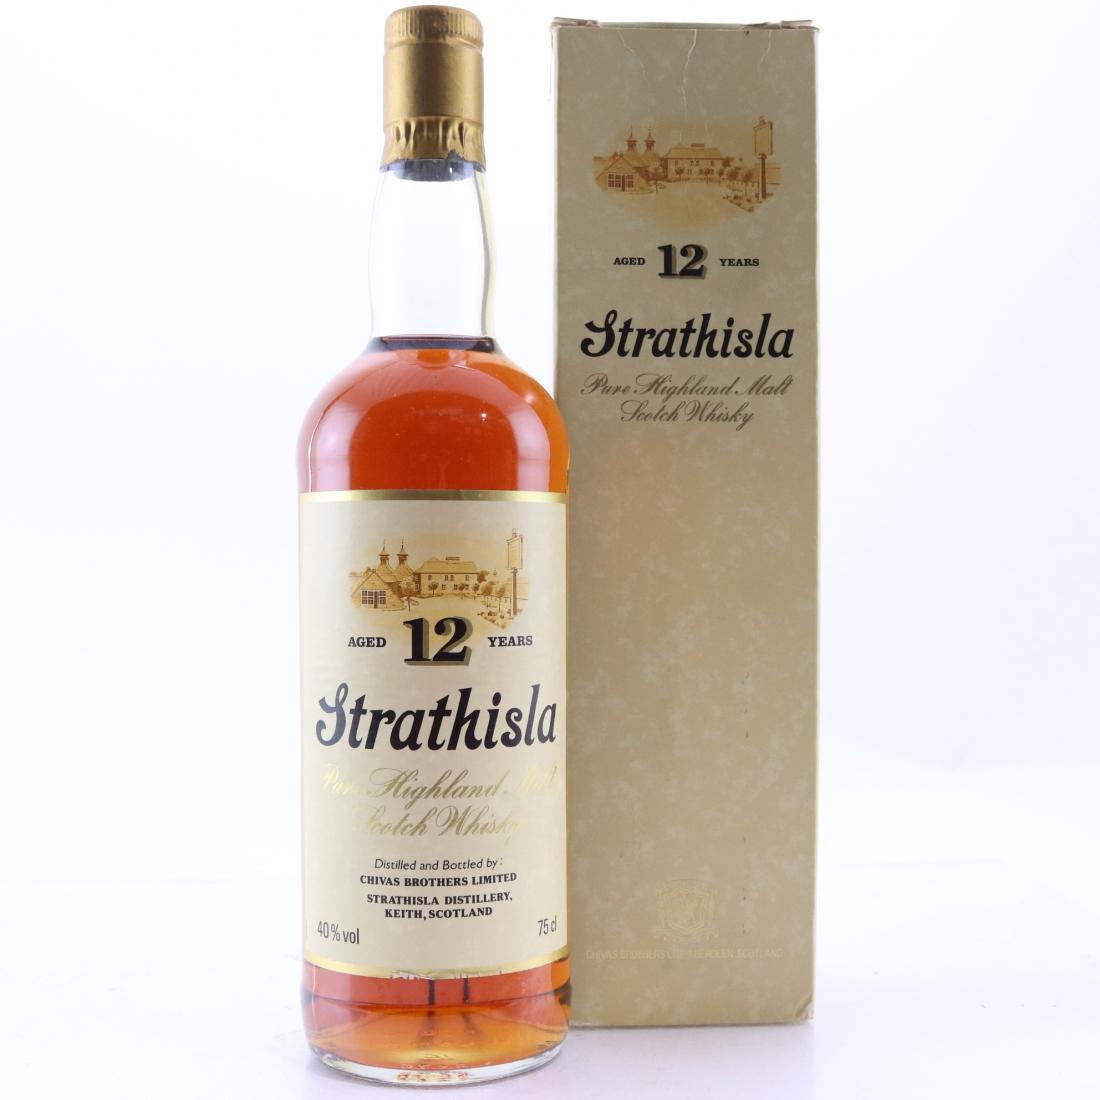 Strathisla 12 Year Old 1980s